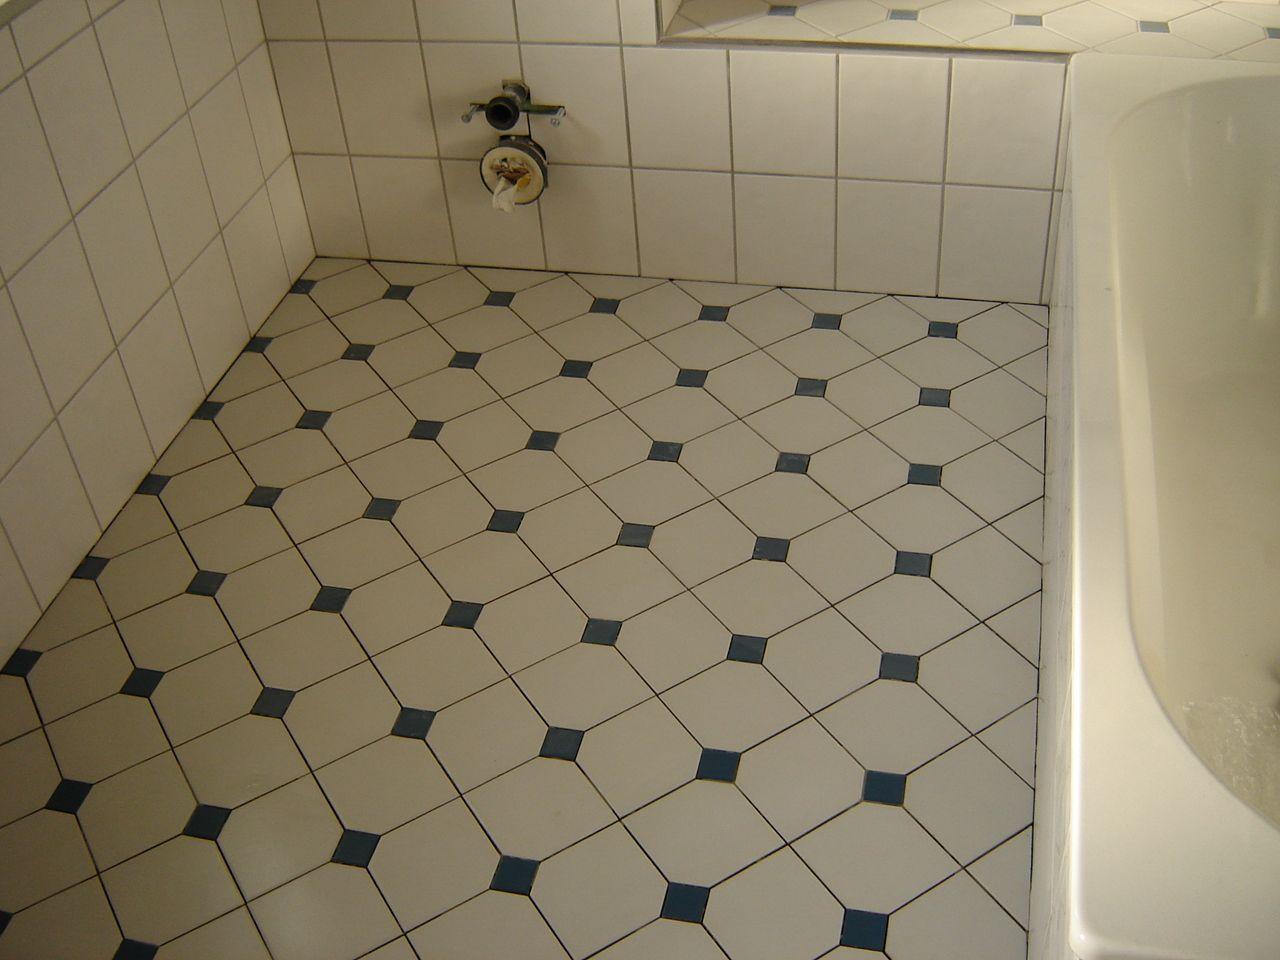 Badezimmer Blau Weis Gefliest #17: Badezimmer Blau Weis Gefliest Full Size Of Innenarchitekturschanes.  Boden13.JPG (1280×960) | Tegels U0026 Betegelde Kamers | Pinterest